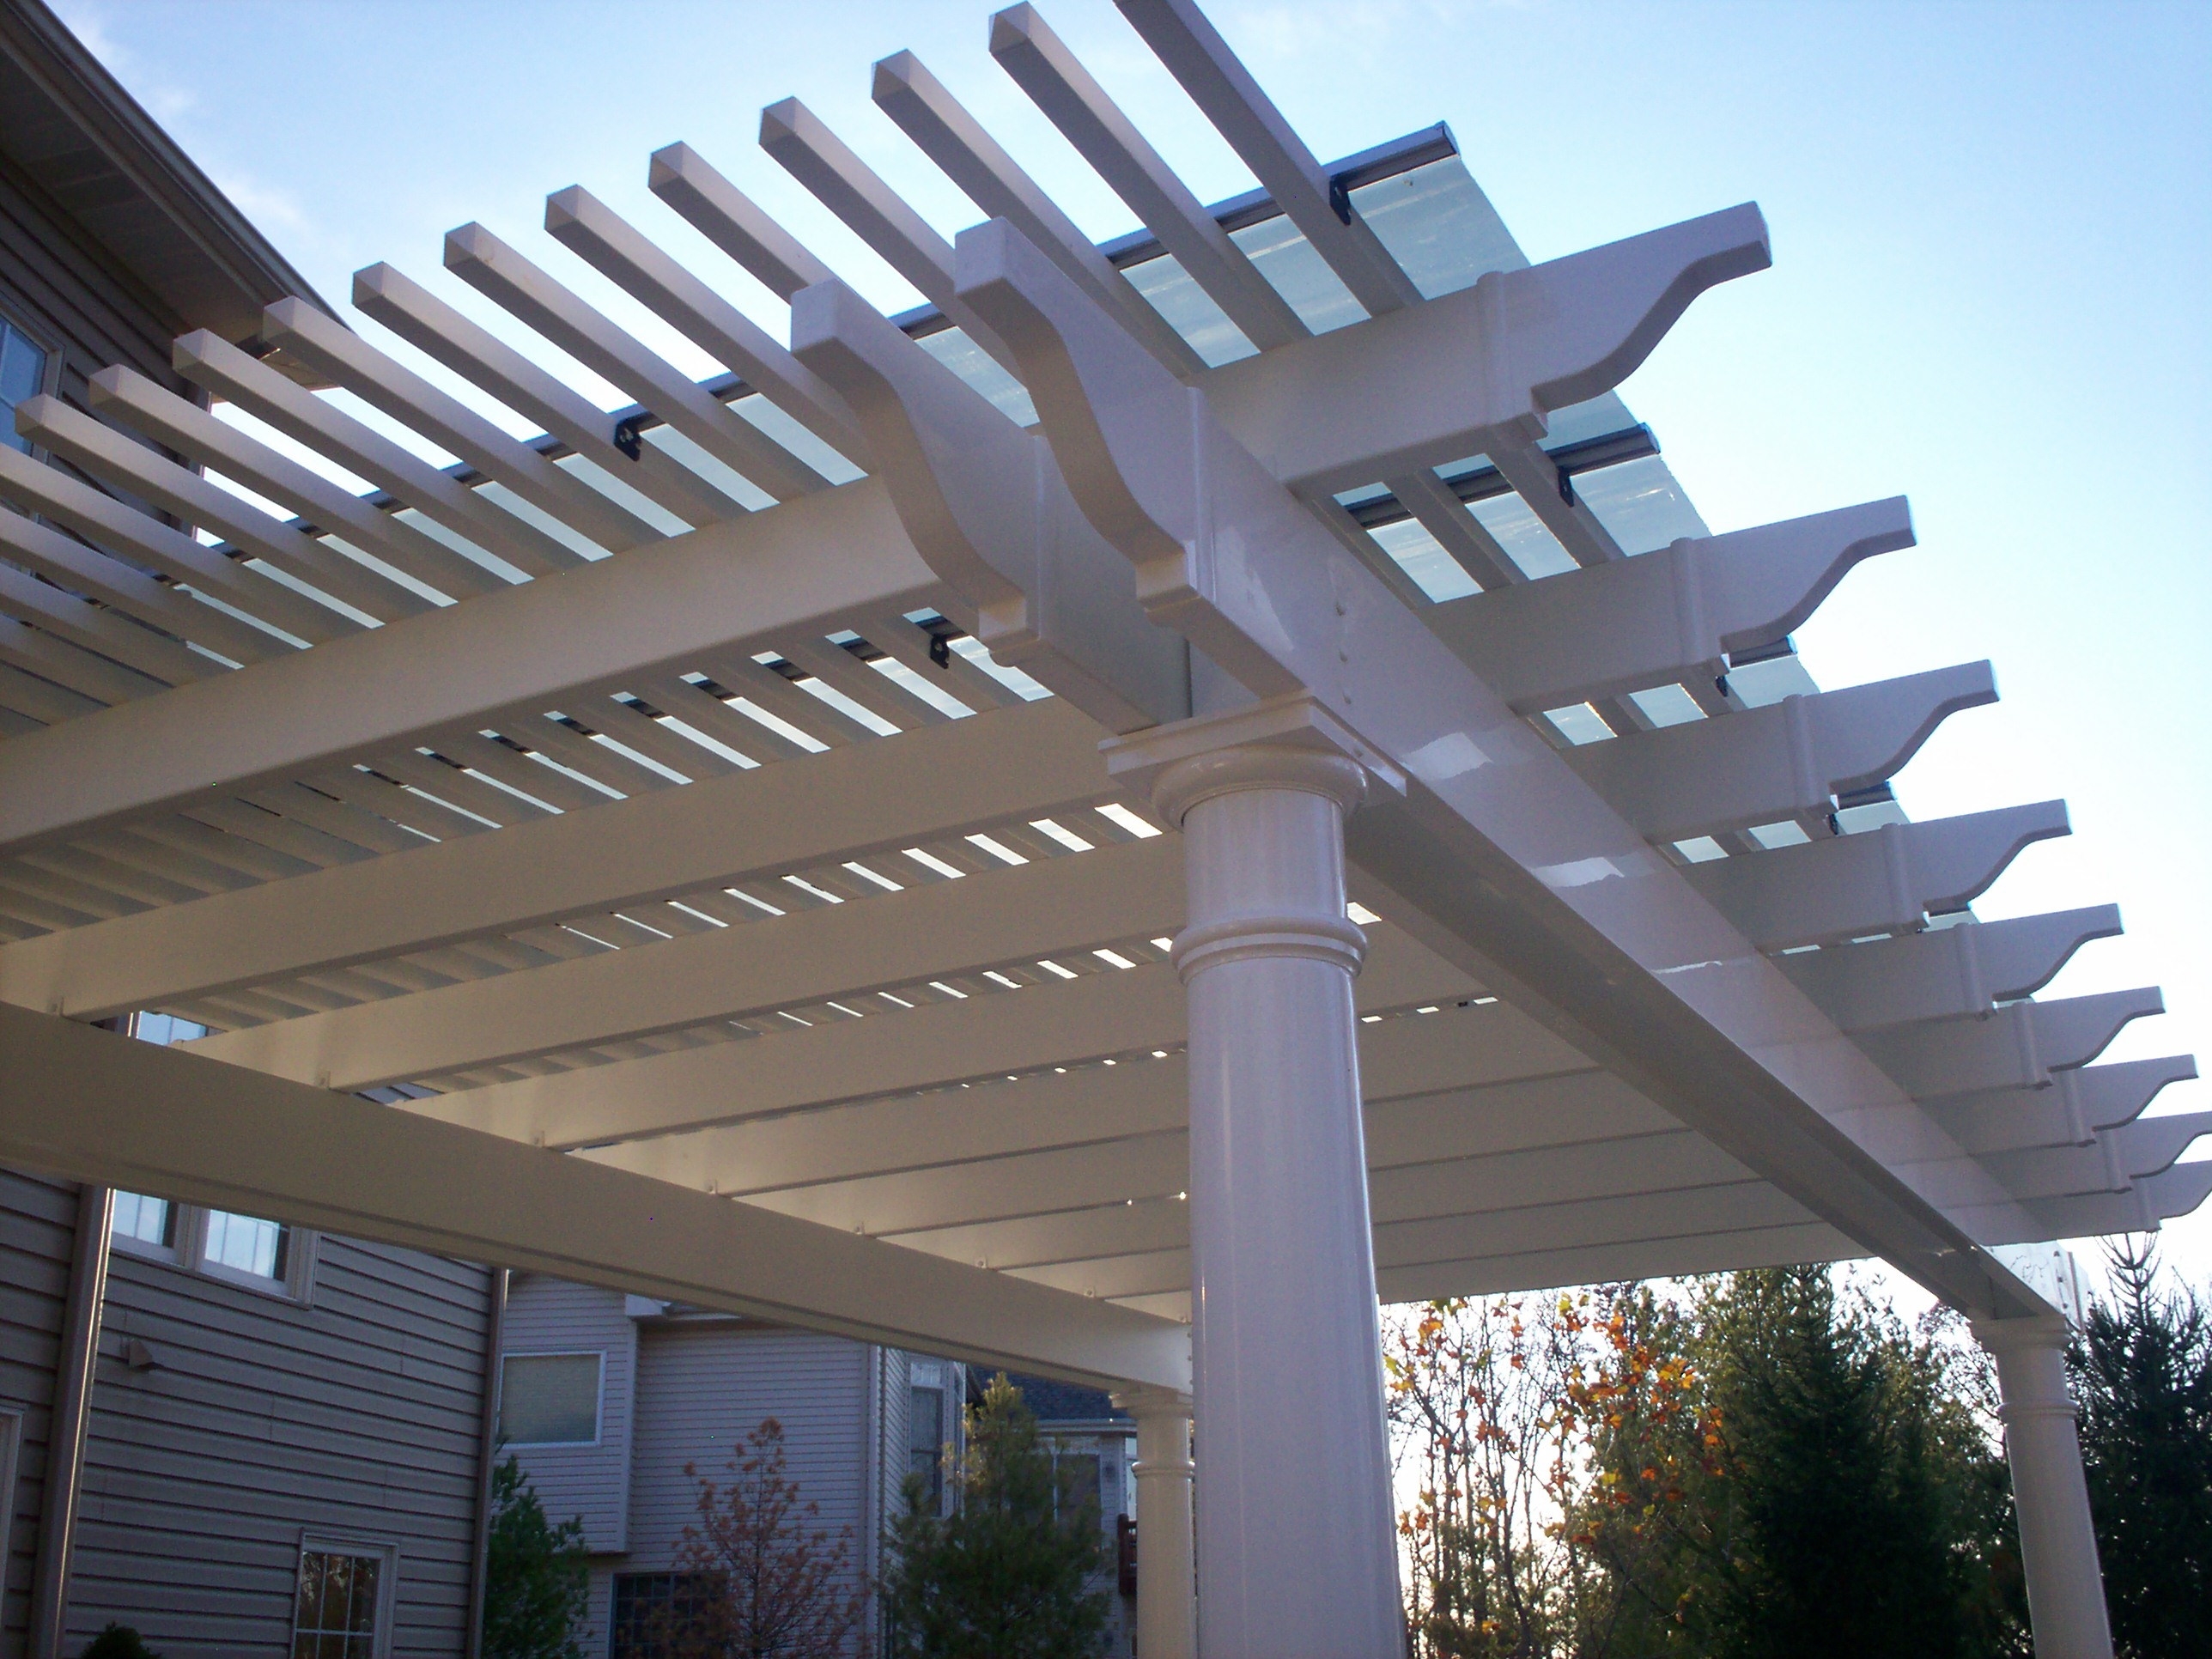 Deck Pergola Design Software Plans Diy Free Download Build Toddler Step Stool Woodwork Saying